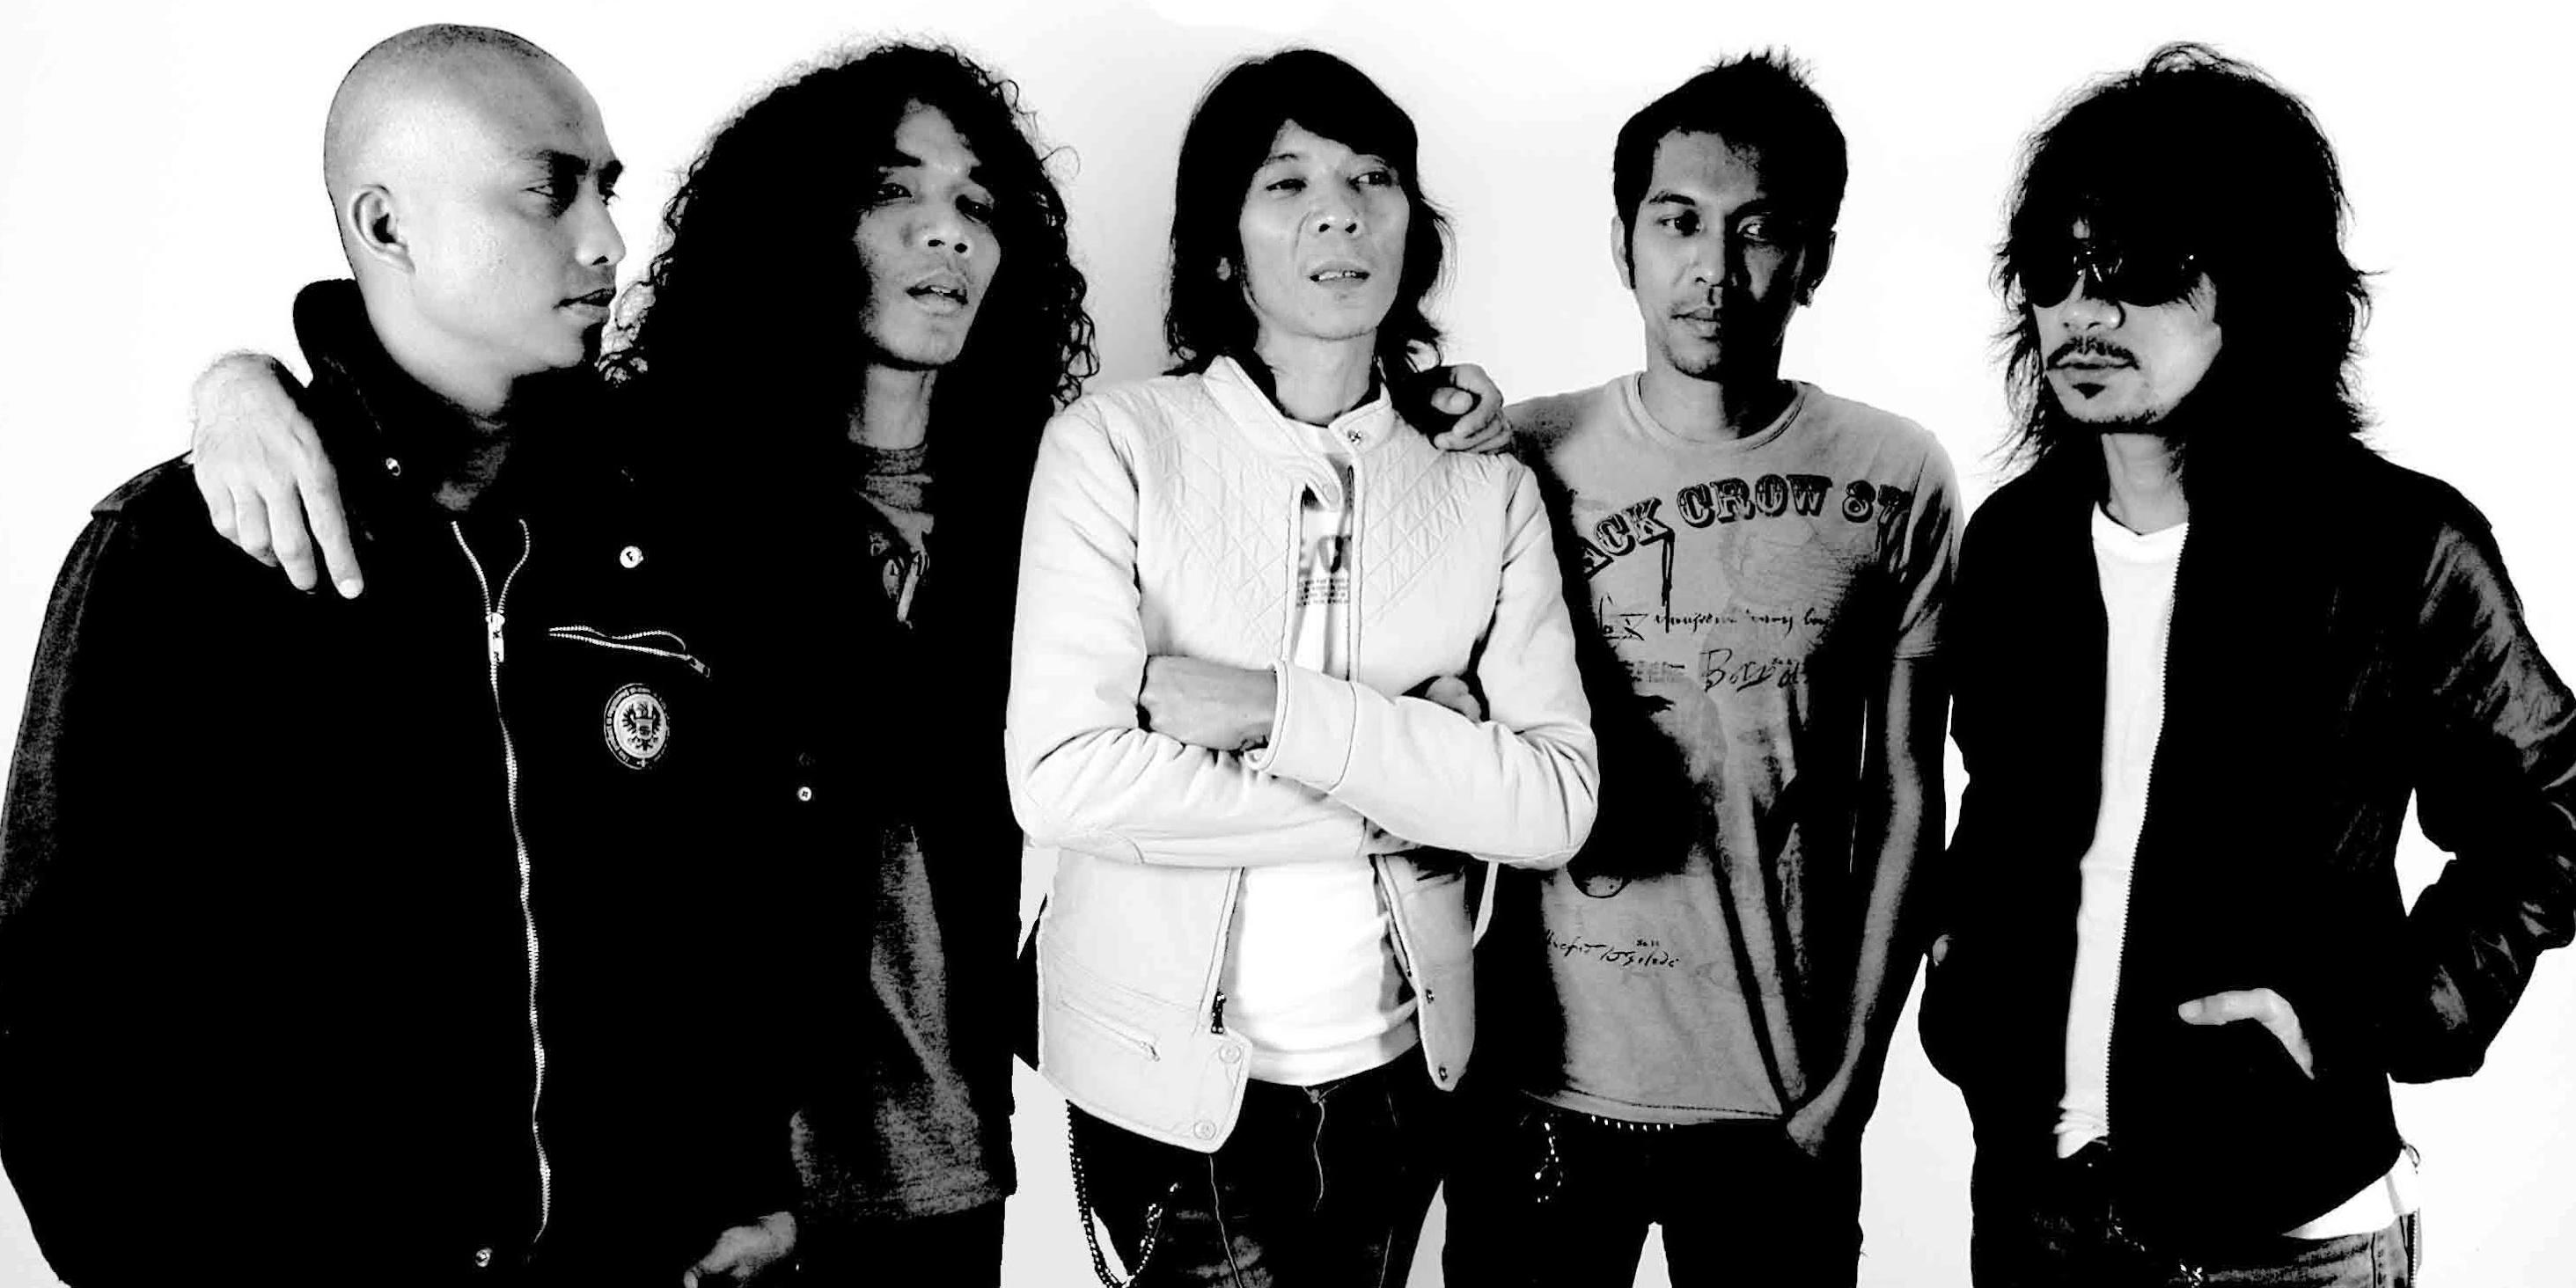 Slank recorded Palalopeyank with Steve Lillywhite